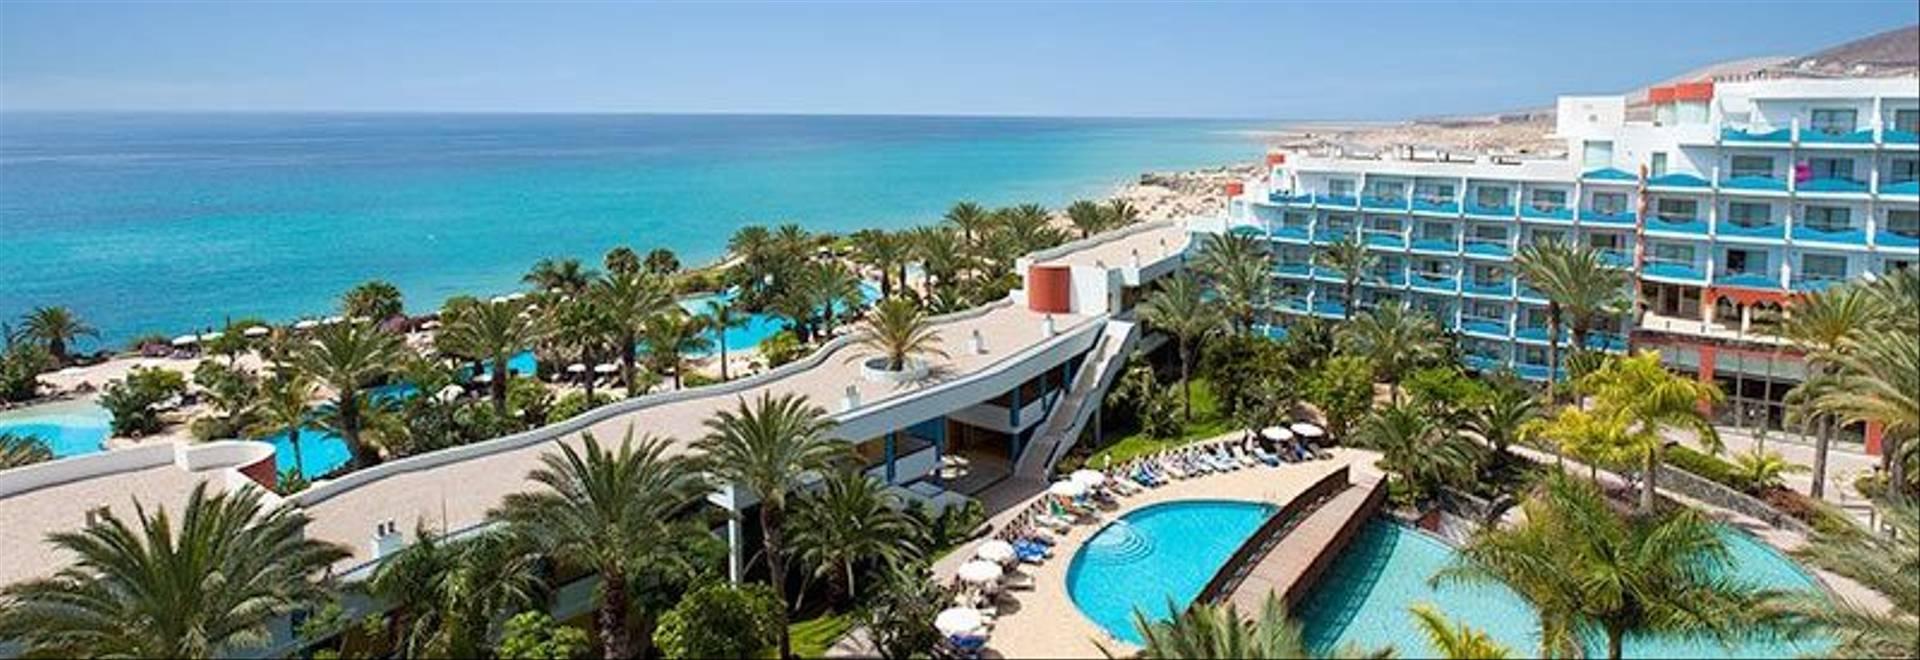 R2 Pajara Beach Hotel 1